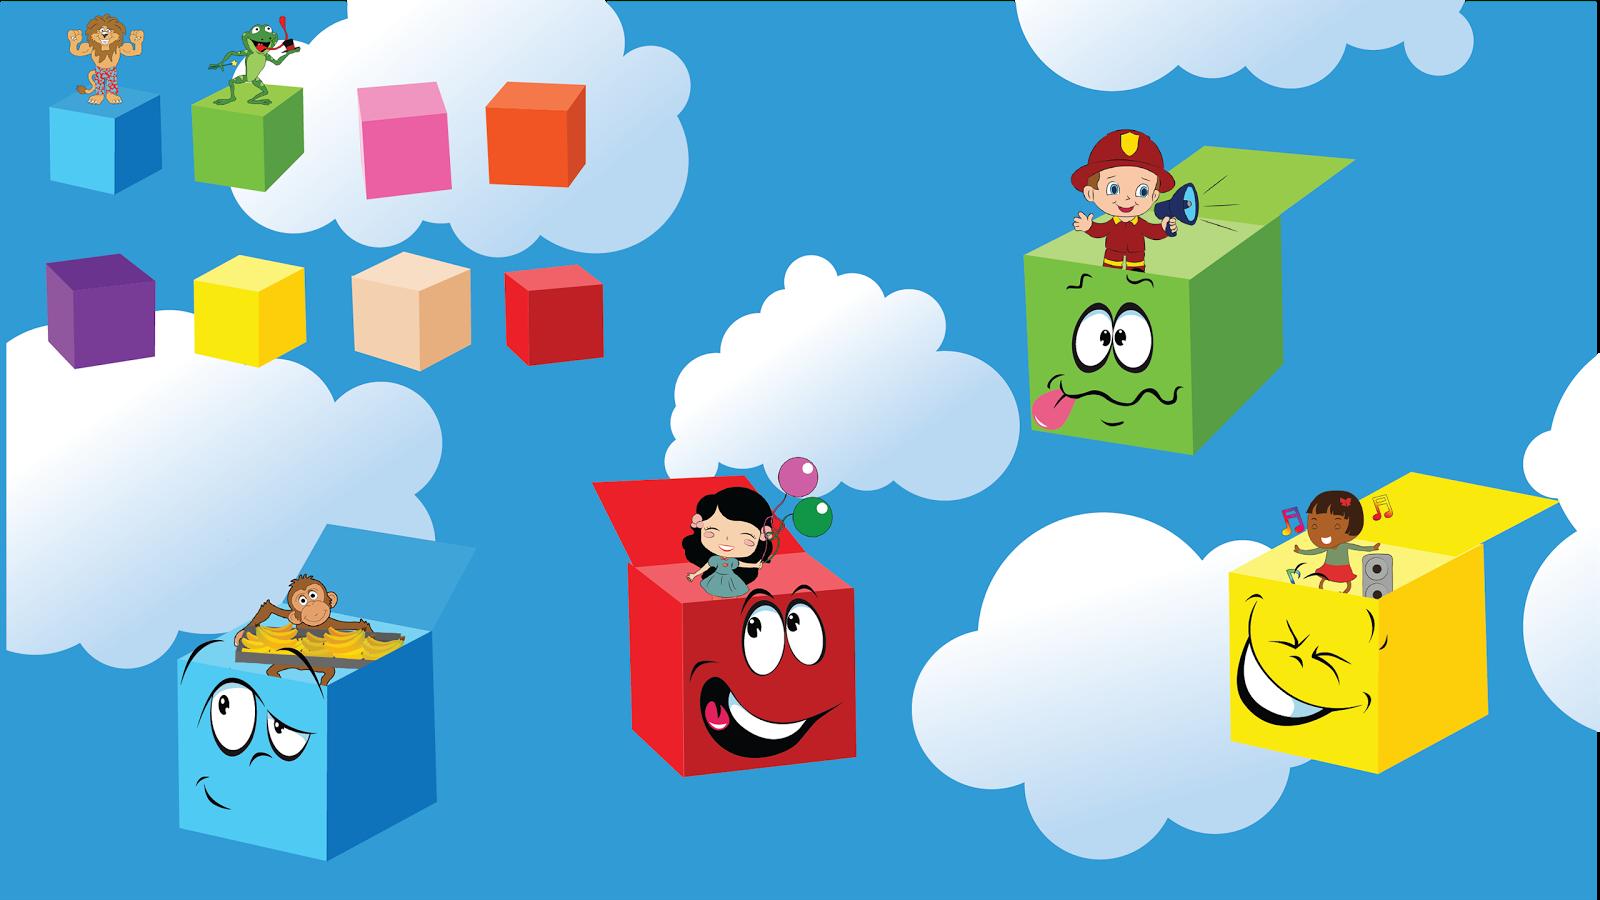 ein memory spiel f r kinder android apps on google play. Black Bedroom Furniture Sets. Home Design Ideas